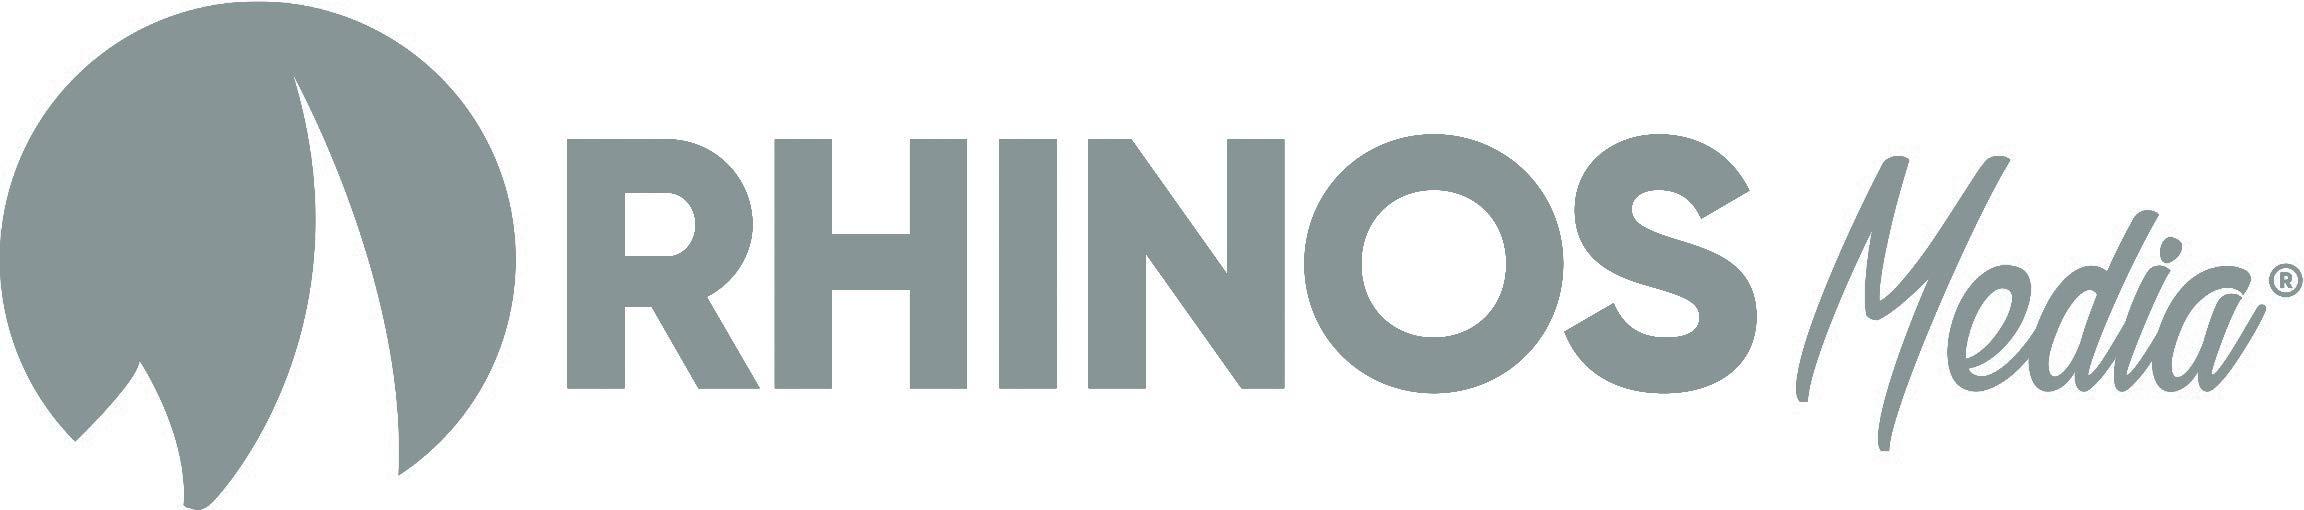 Rhinos Media logo